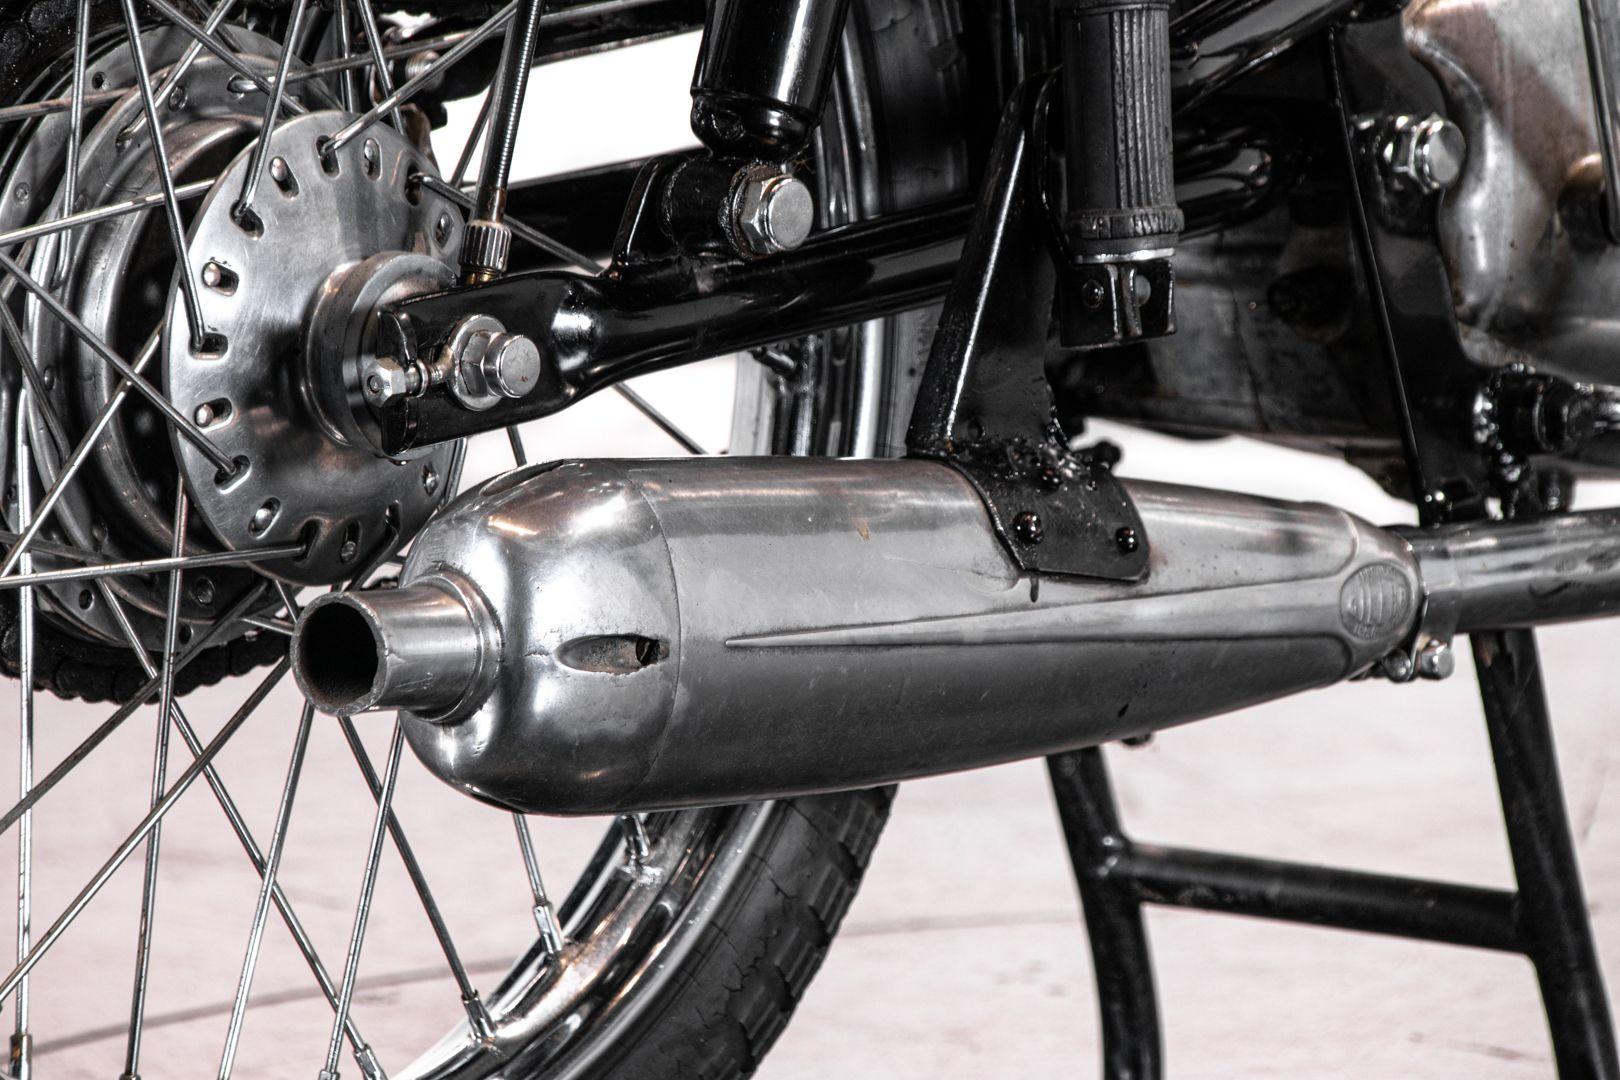 1960 Gilera 150 64021